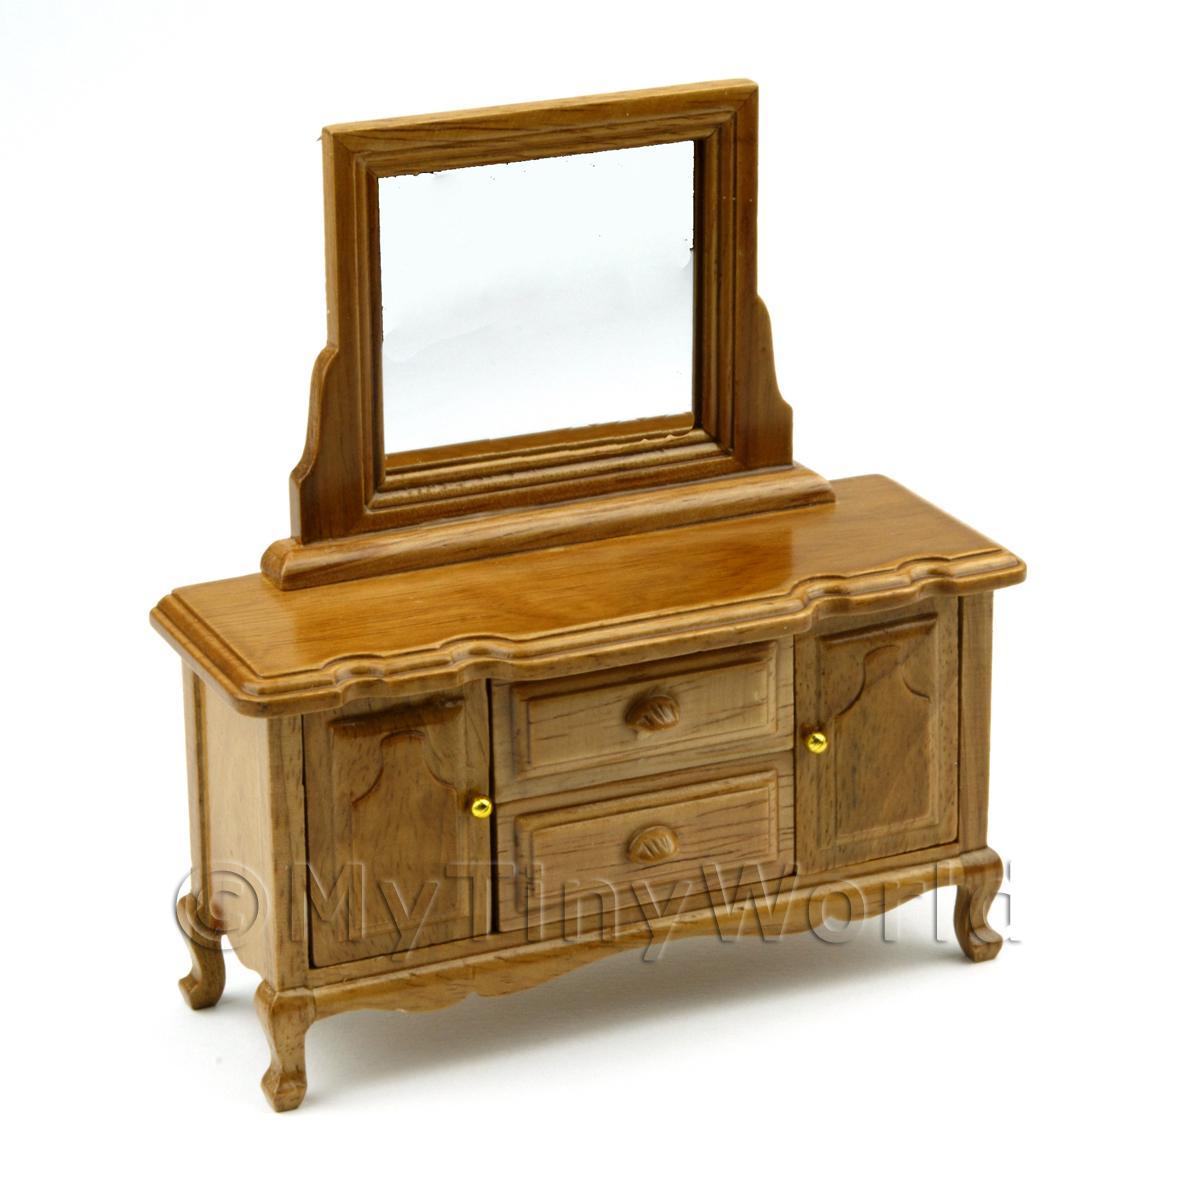 #432307 Details About Solid Wood Oak Dresser Dolls House Furniture (FR63) with 1200x1200 px of Most Effective Oak Wood Dresser 12001200 wallpaper @ avoidforclosure.info